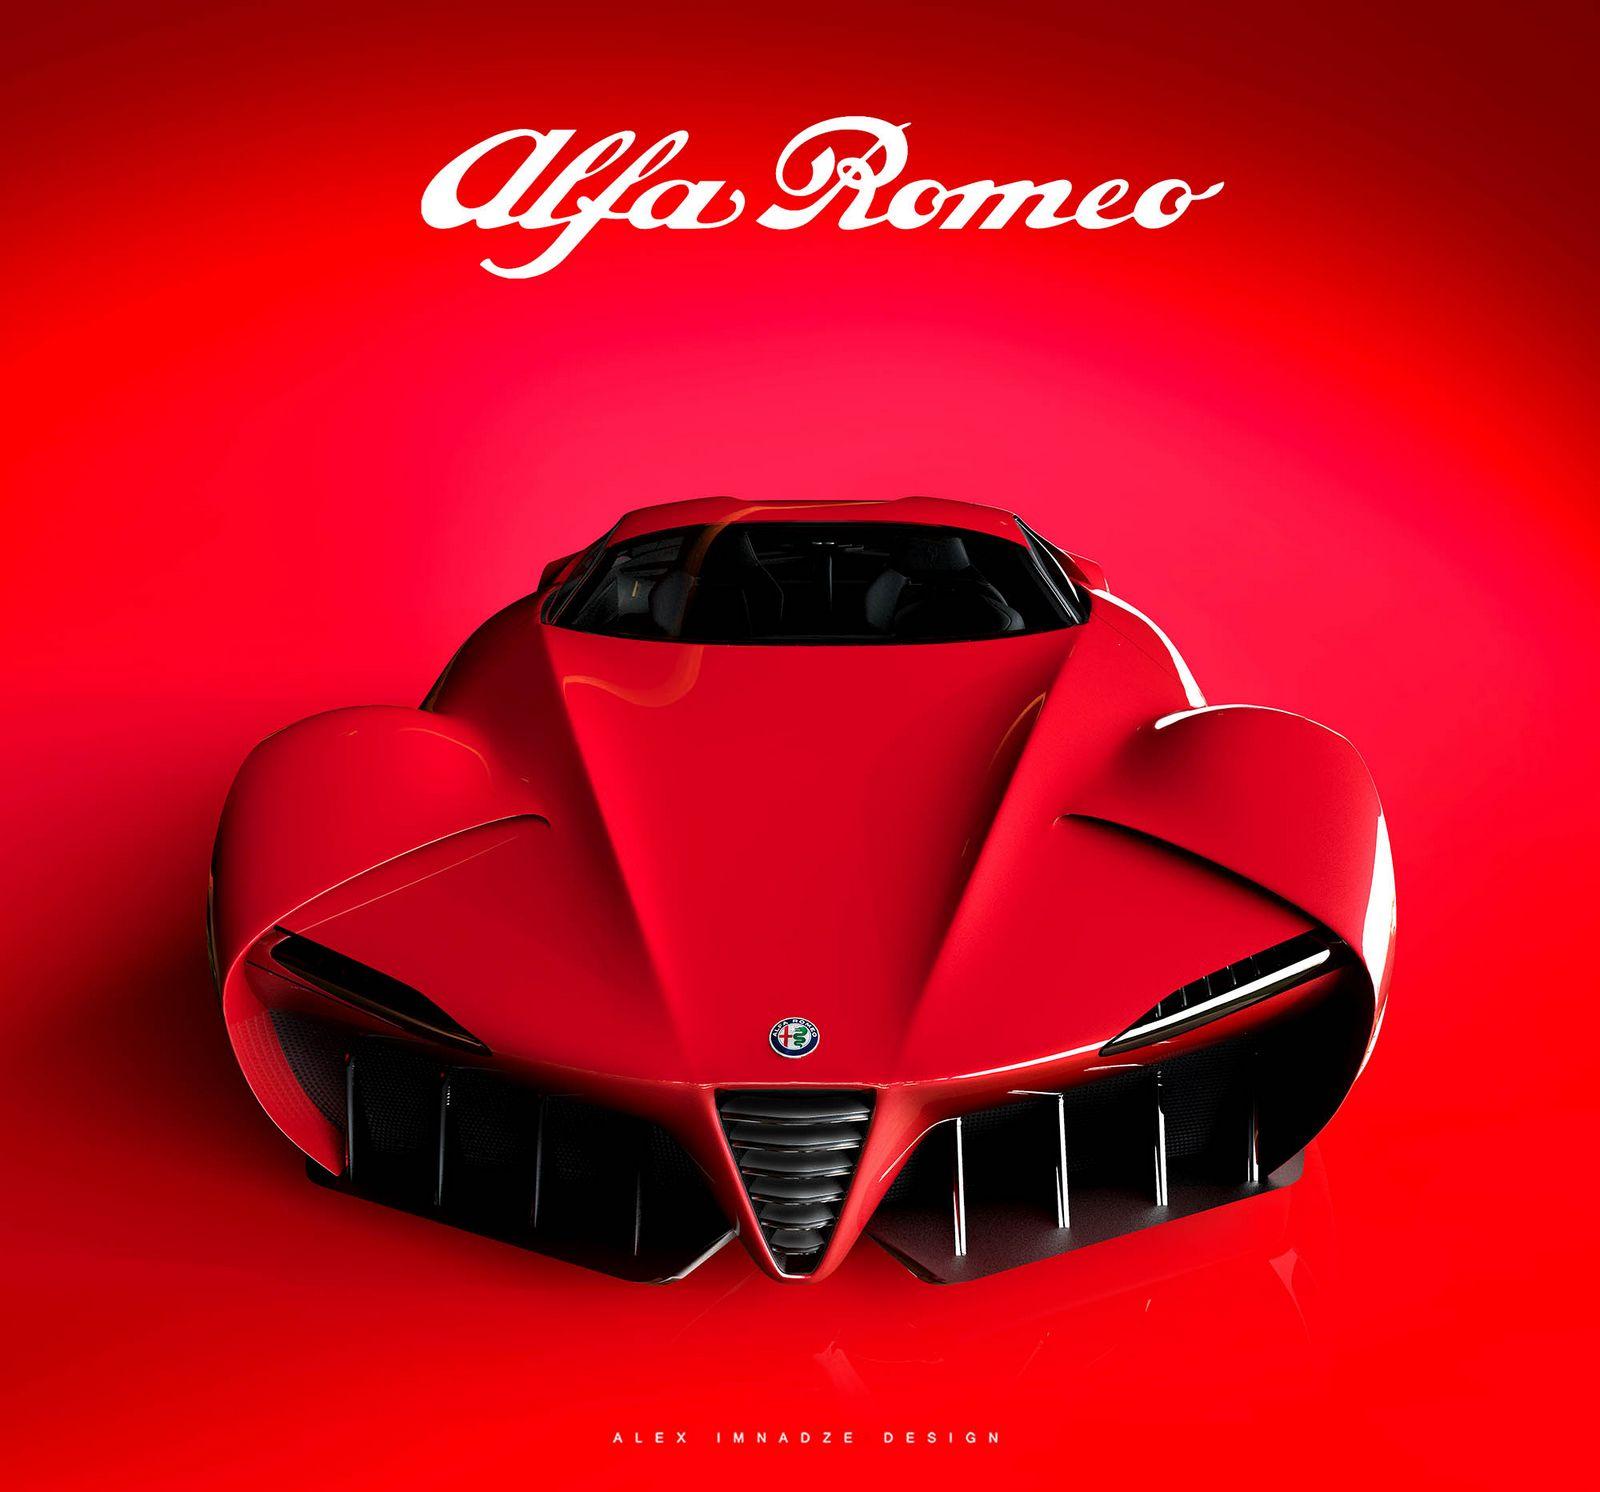 Alfa Romeo 6C Disco Volante Design Study Is An Italian